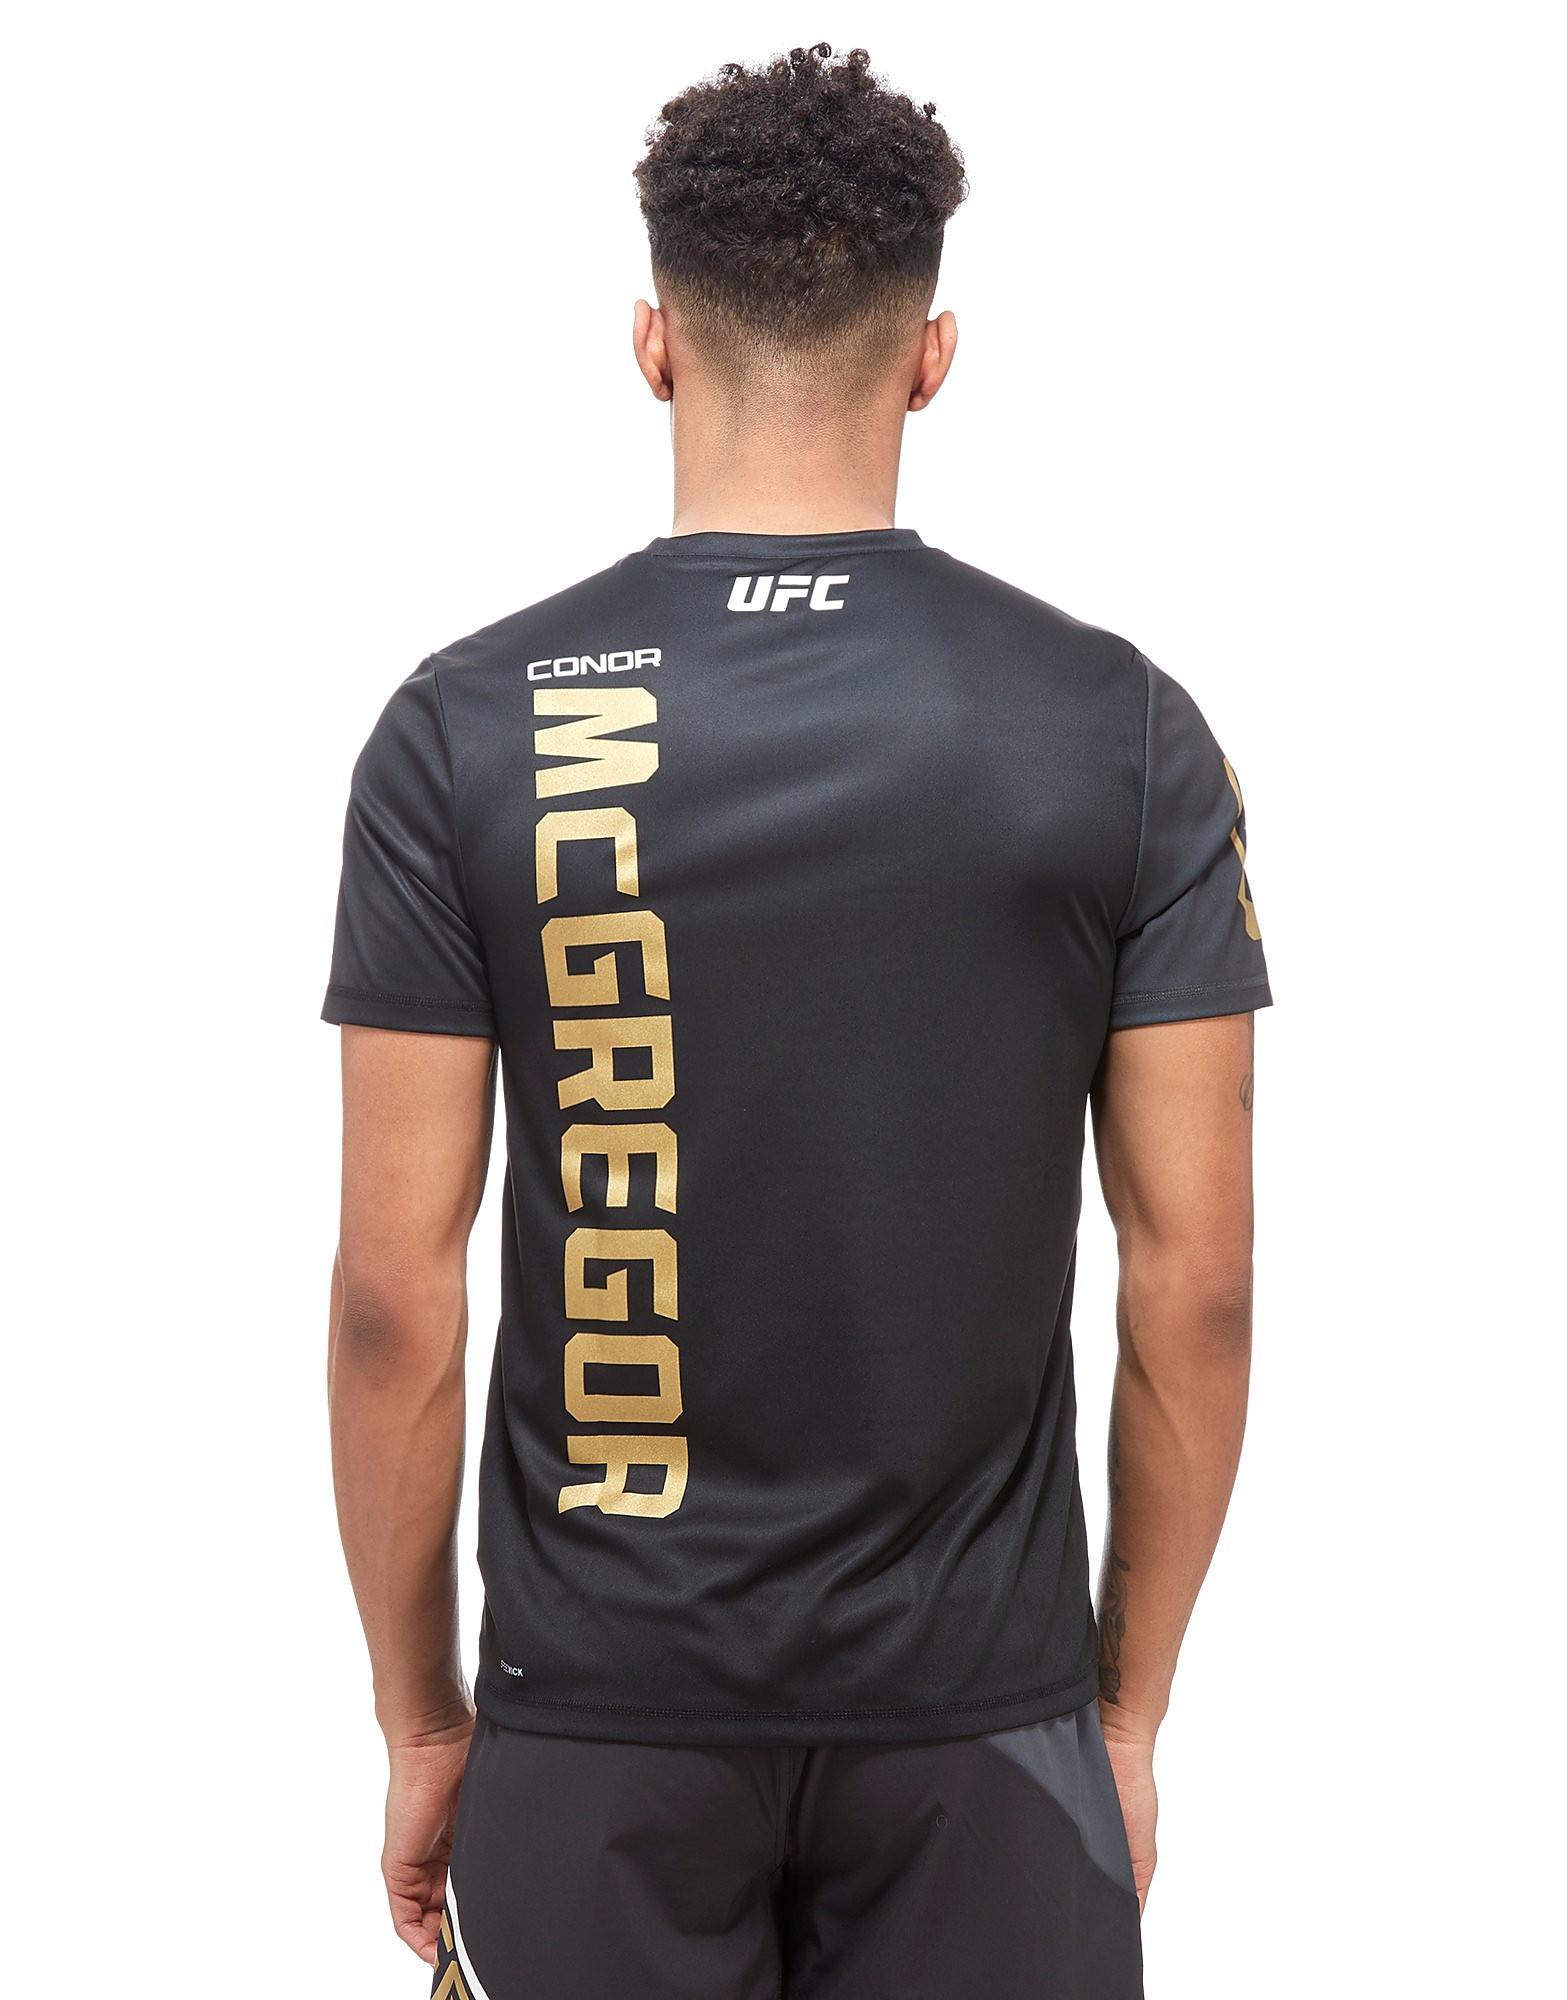 Reebok UFC Conor McGregor Walkout T-Shirt